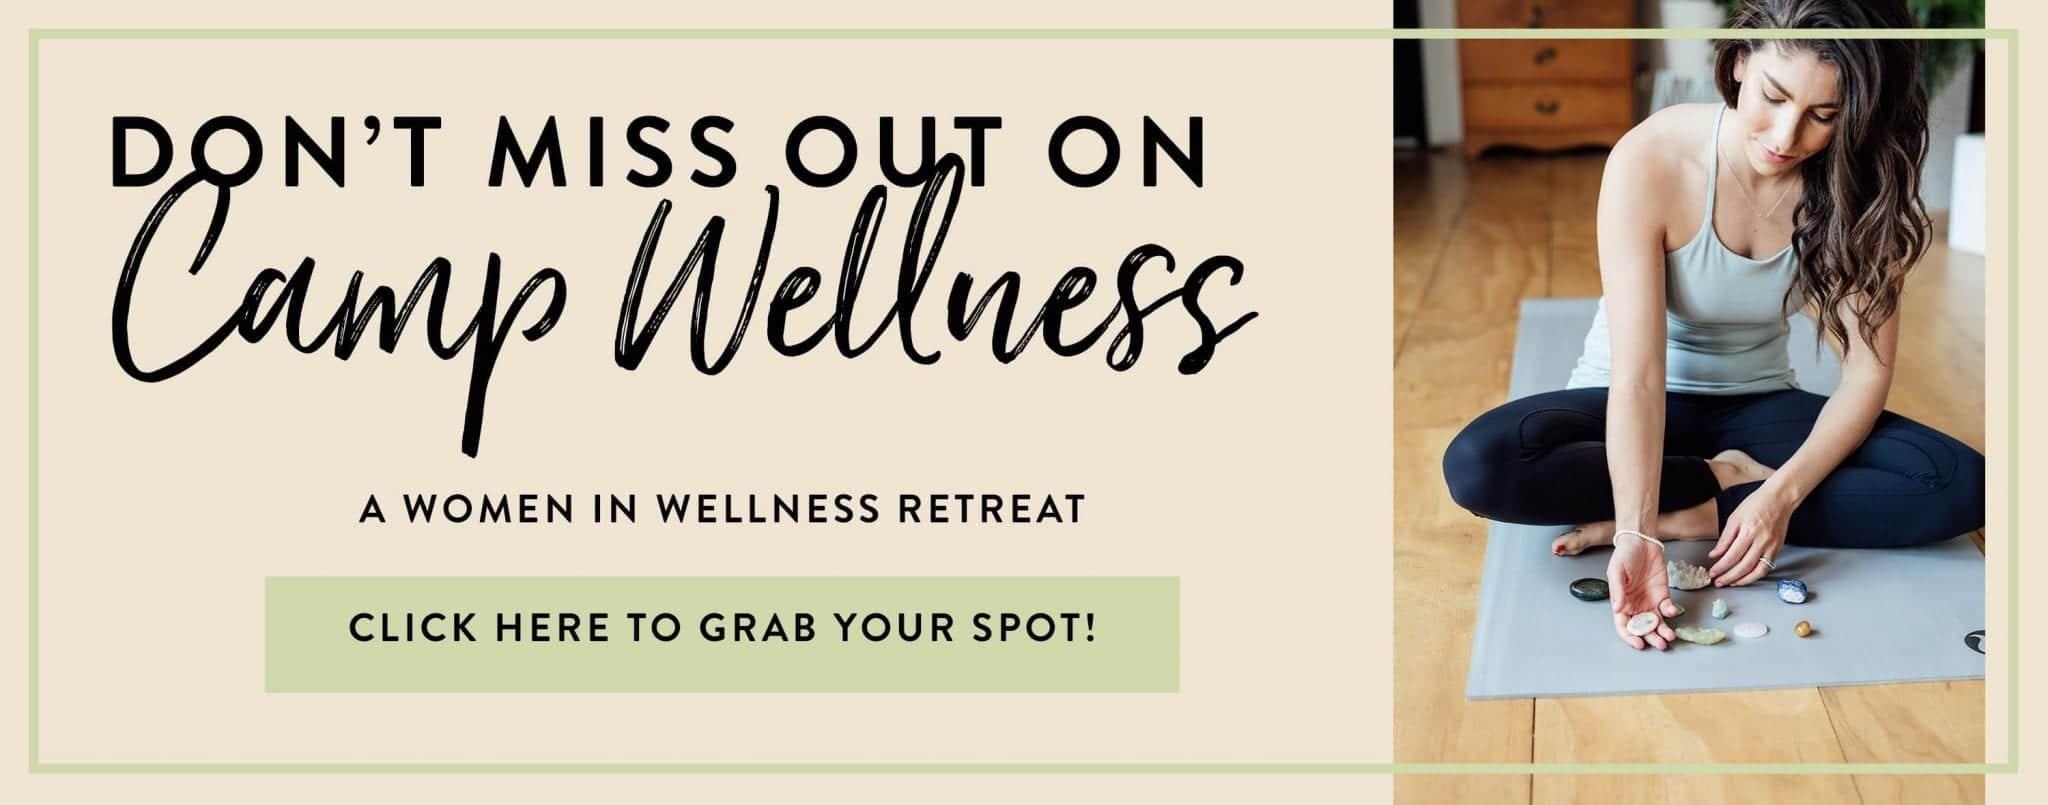 Camp Wellness Sponsors - The Healthy Maven